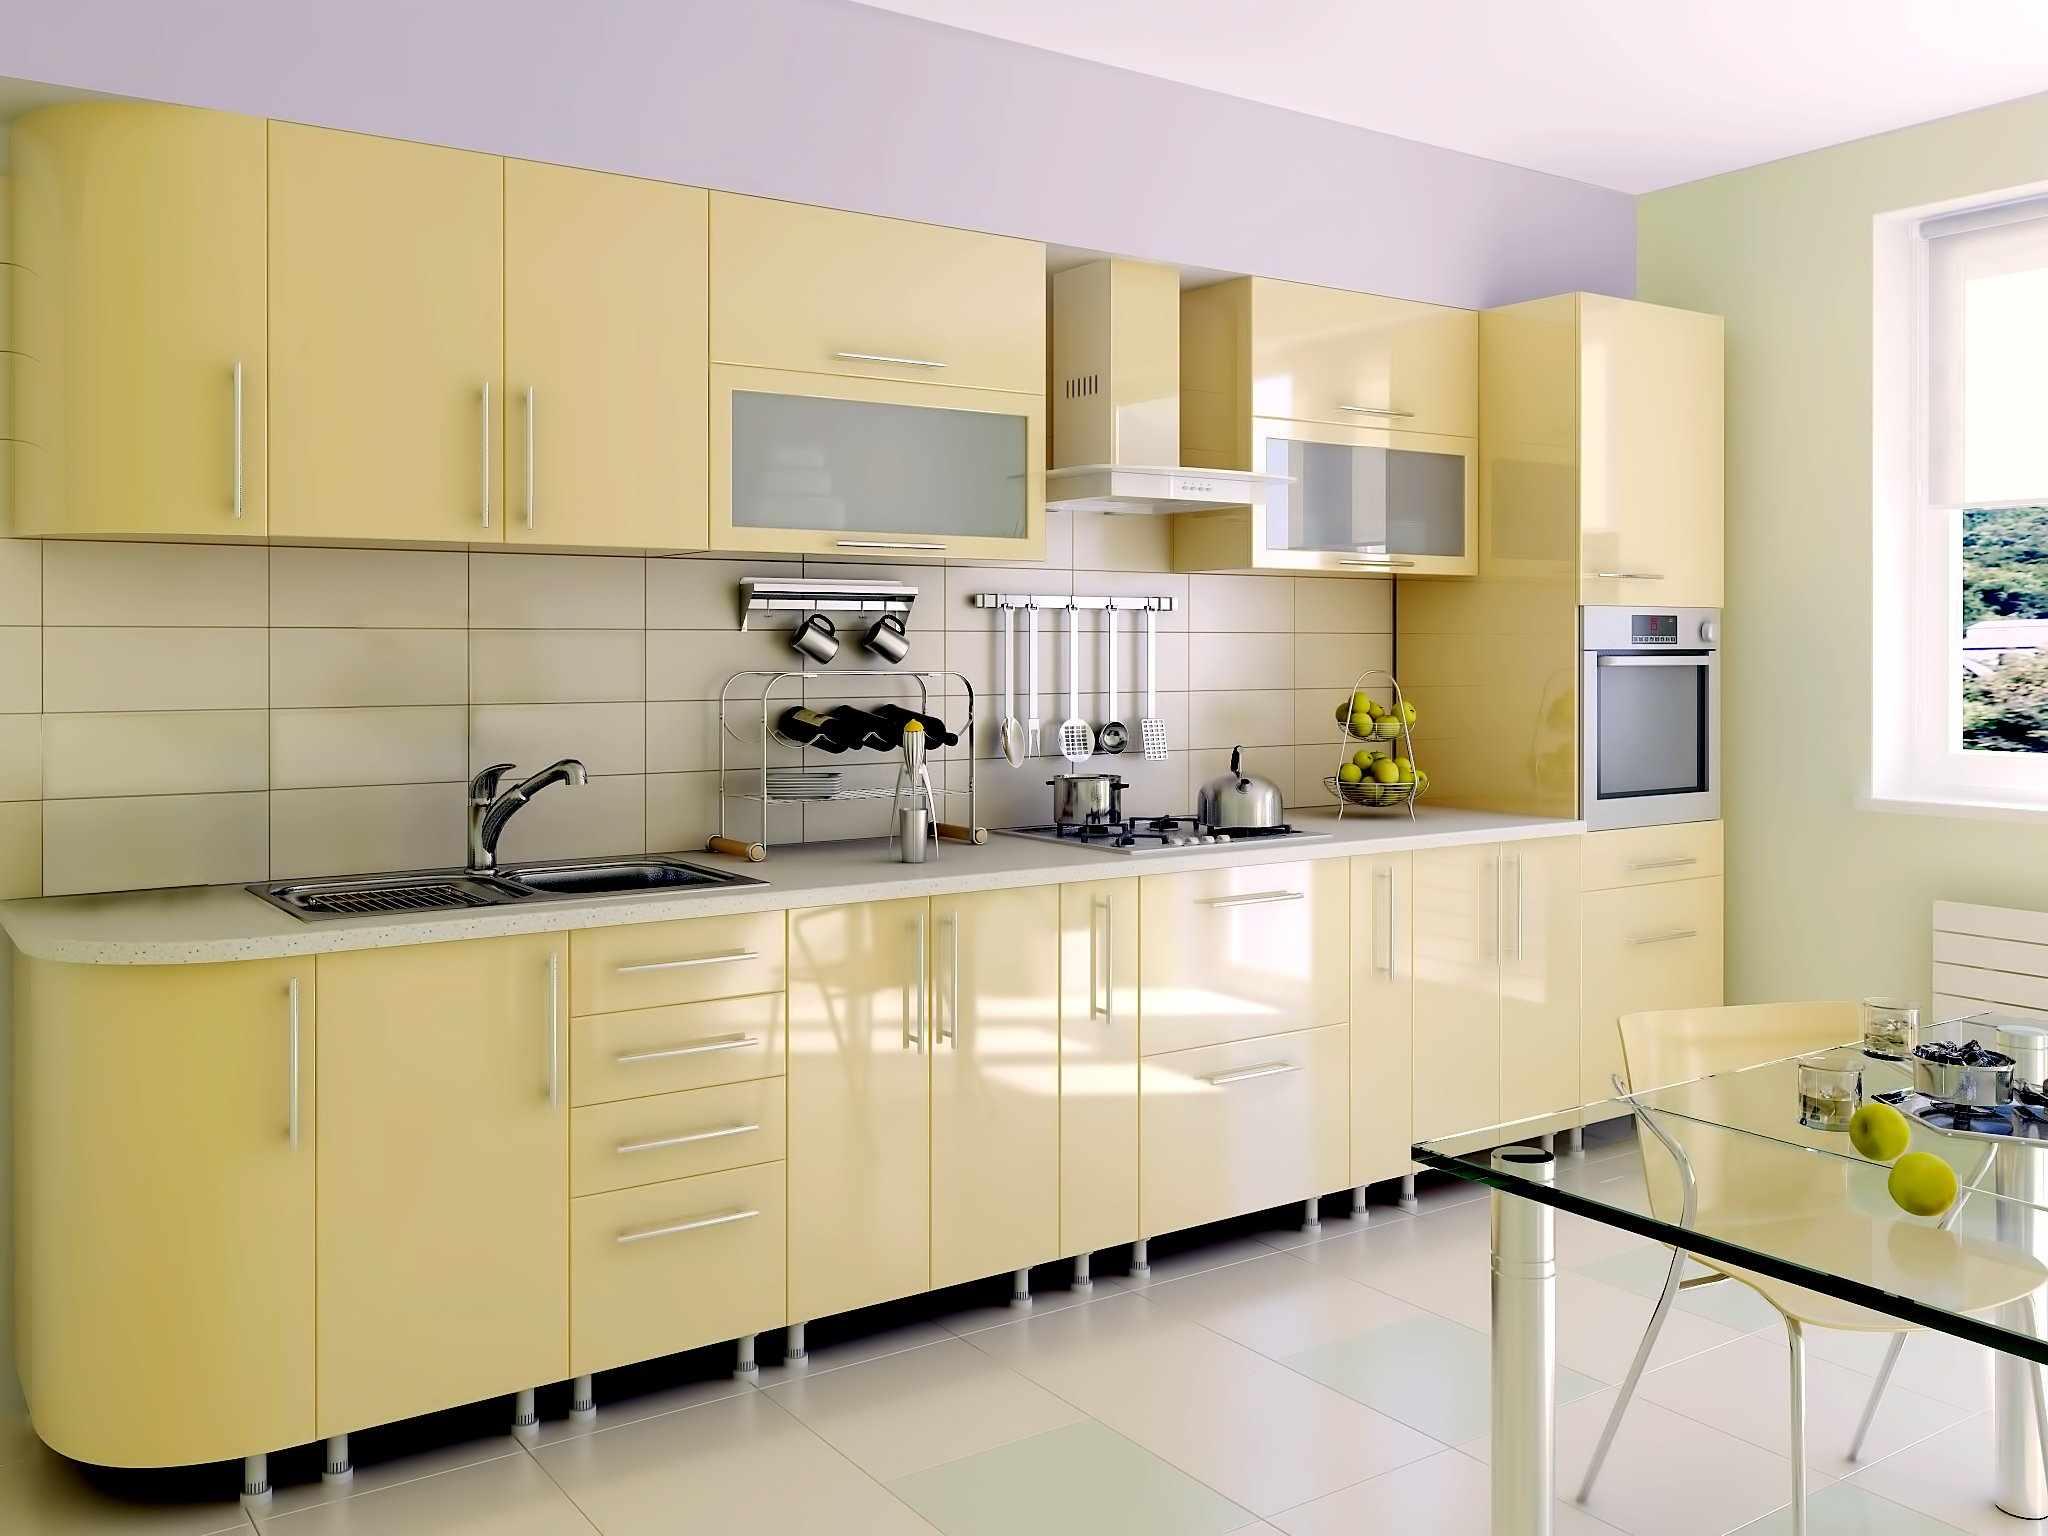 Фасады для кухни с покрытием ПВХ